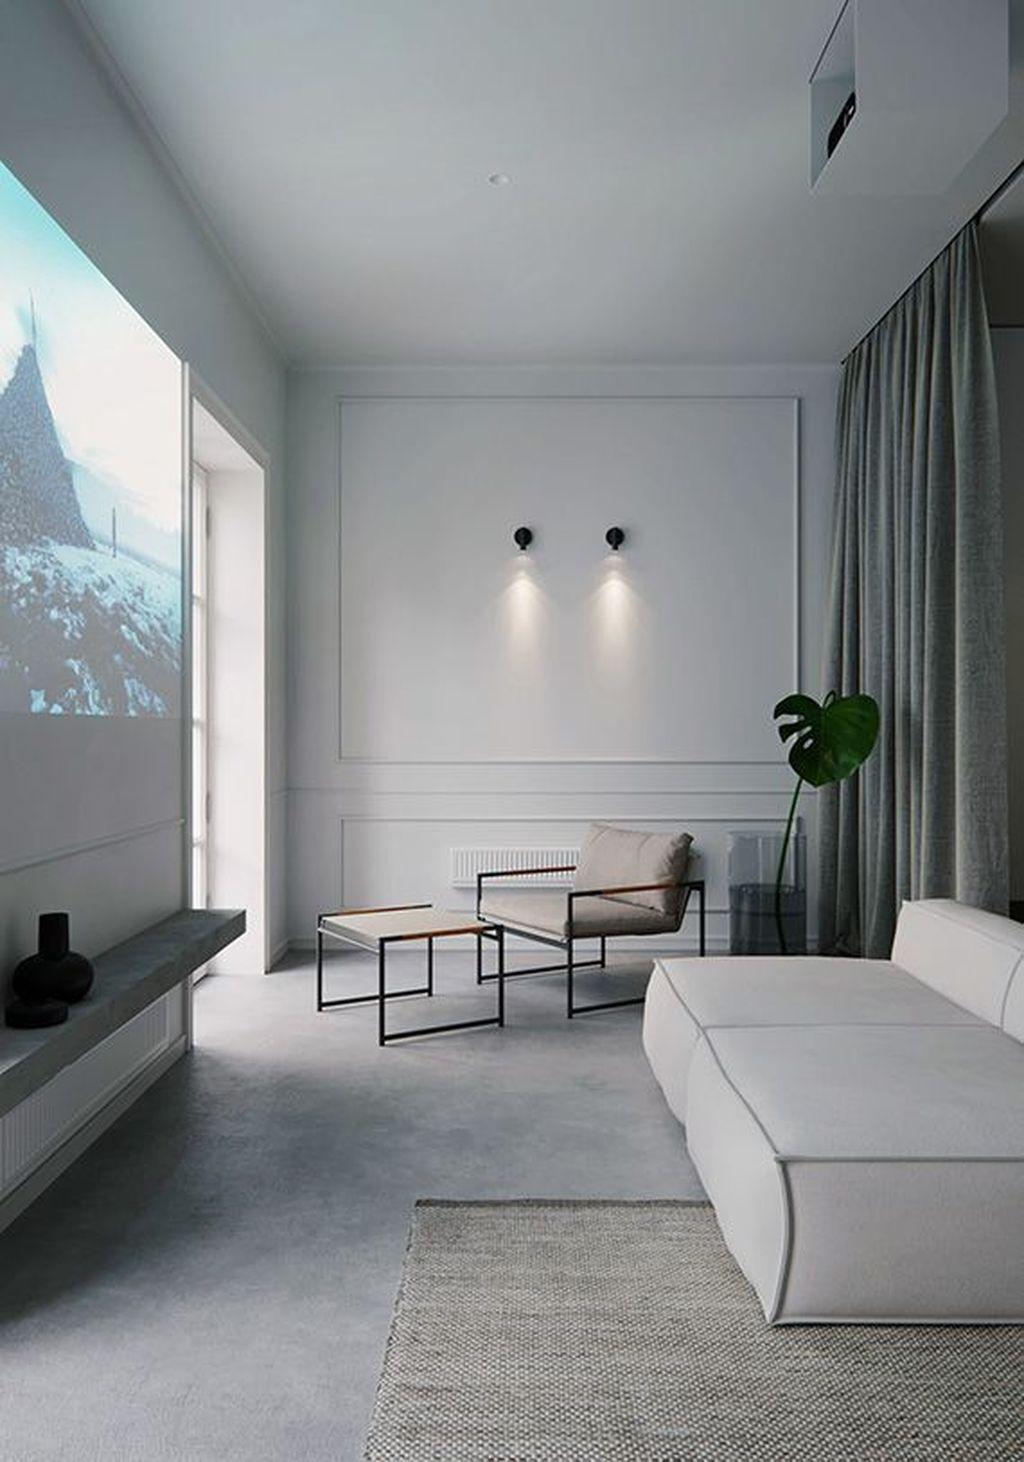 33 Elegant Apartments Design Ideas That Celebrate Minimalist Style